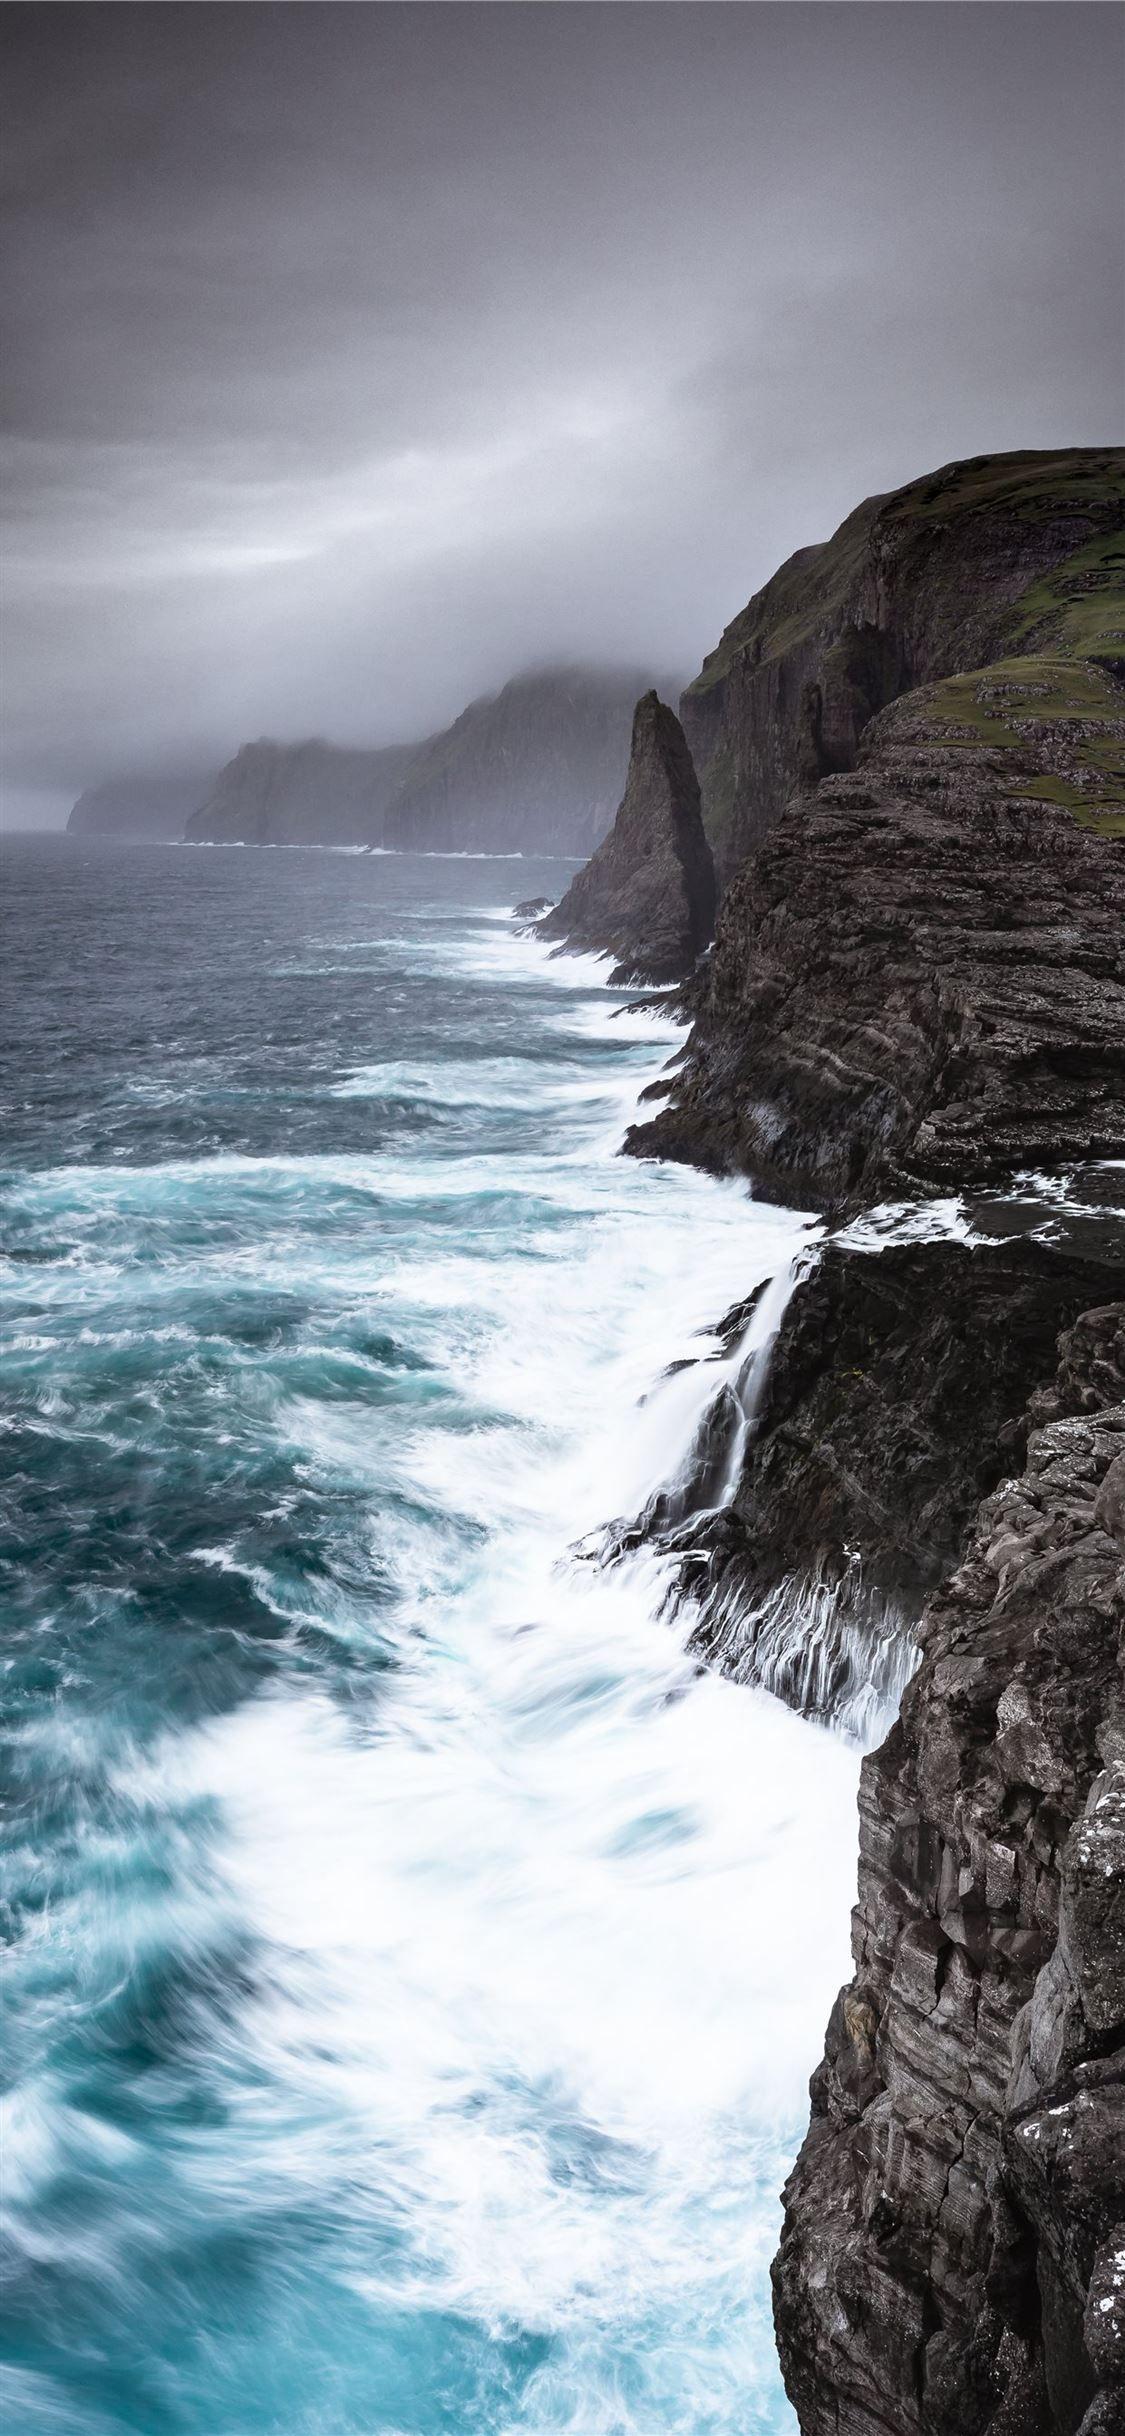 waves crashing sea cliffs digital wallpaper iPhone 11 Wallpapers